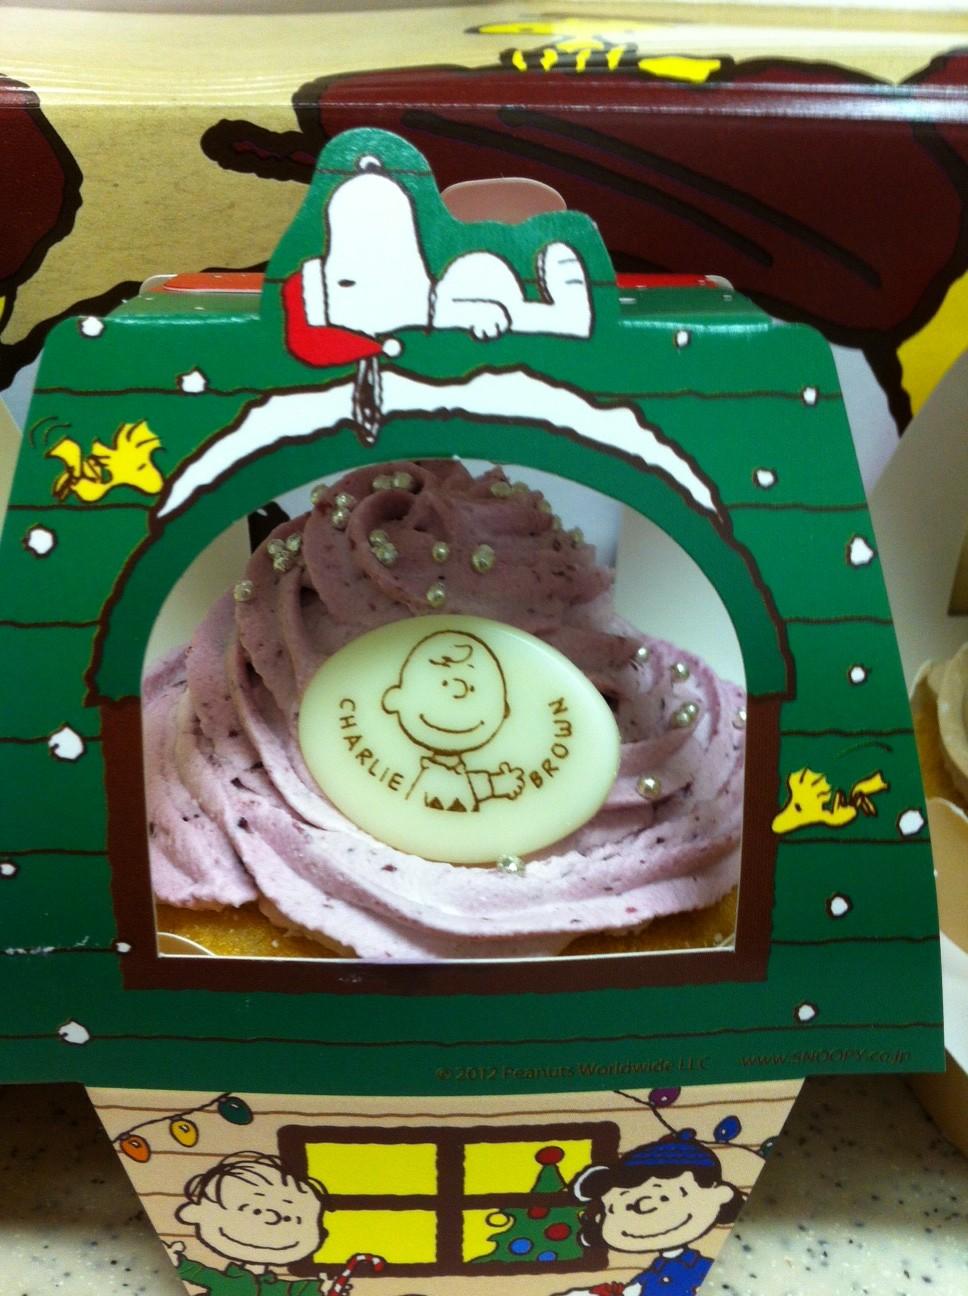 Mister Donut Snoopy S Mont Blanc House ミスド スヌーピーのモンブラン